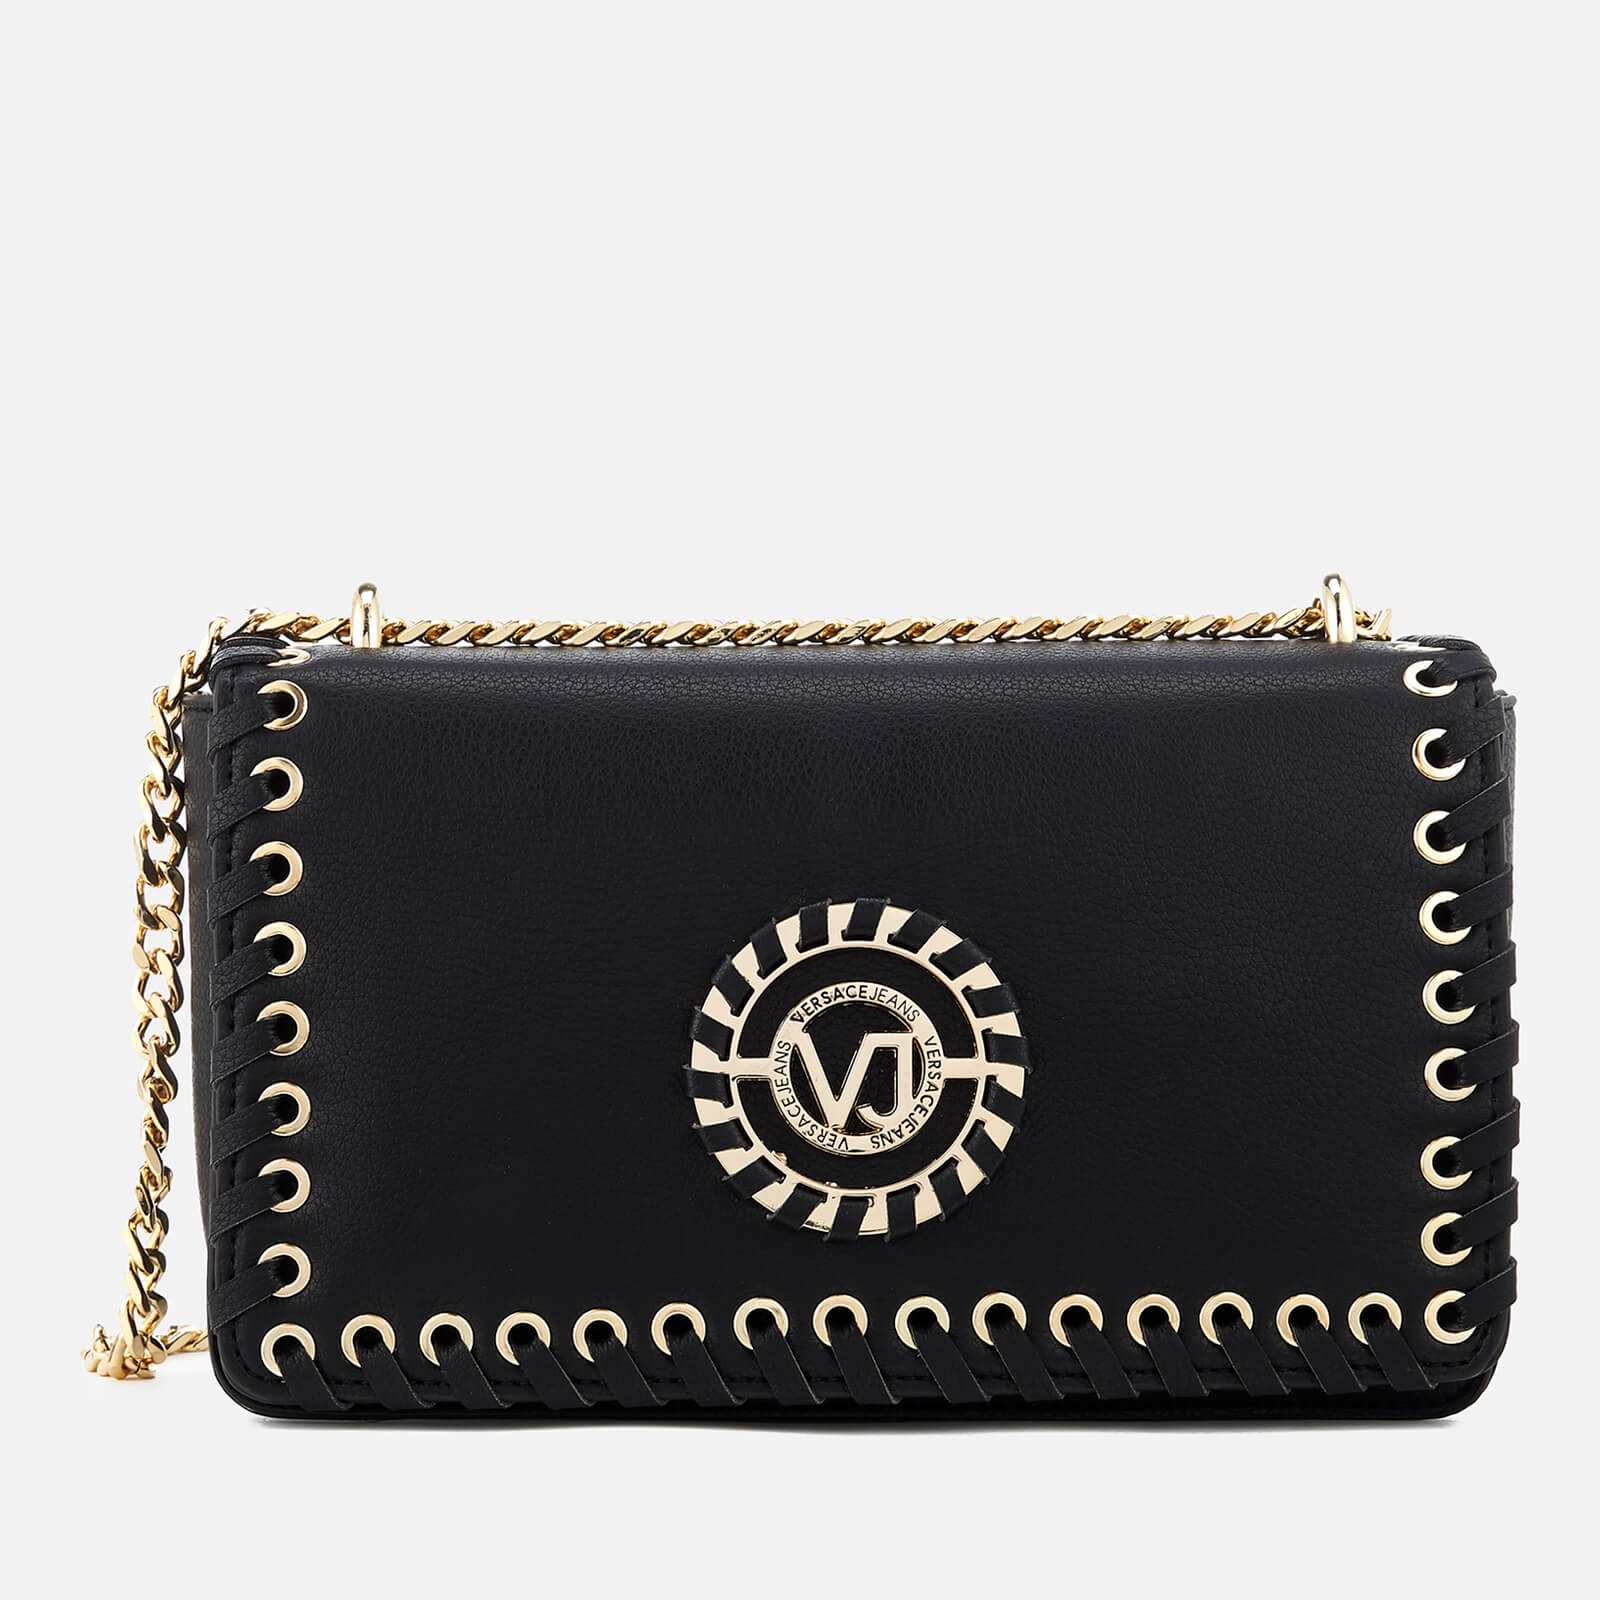 21bd142d410 Versace Jeans Women s Whip Stitched Shoulder Bag - Black Womens Accessories